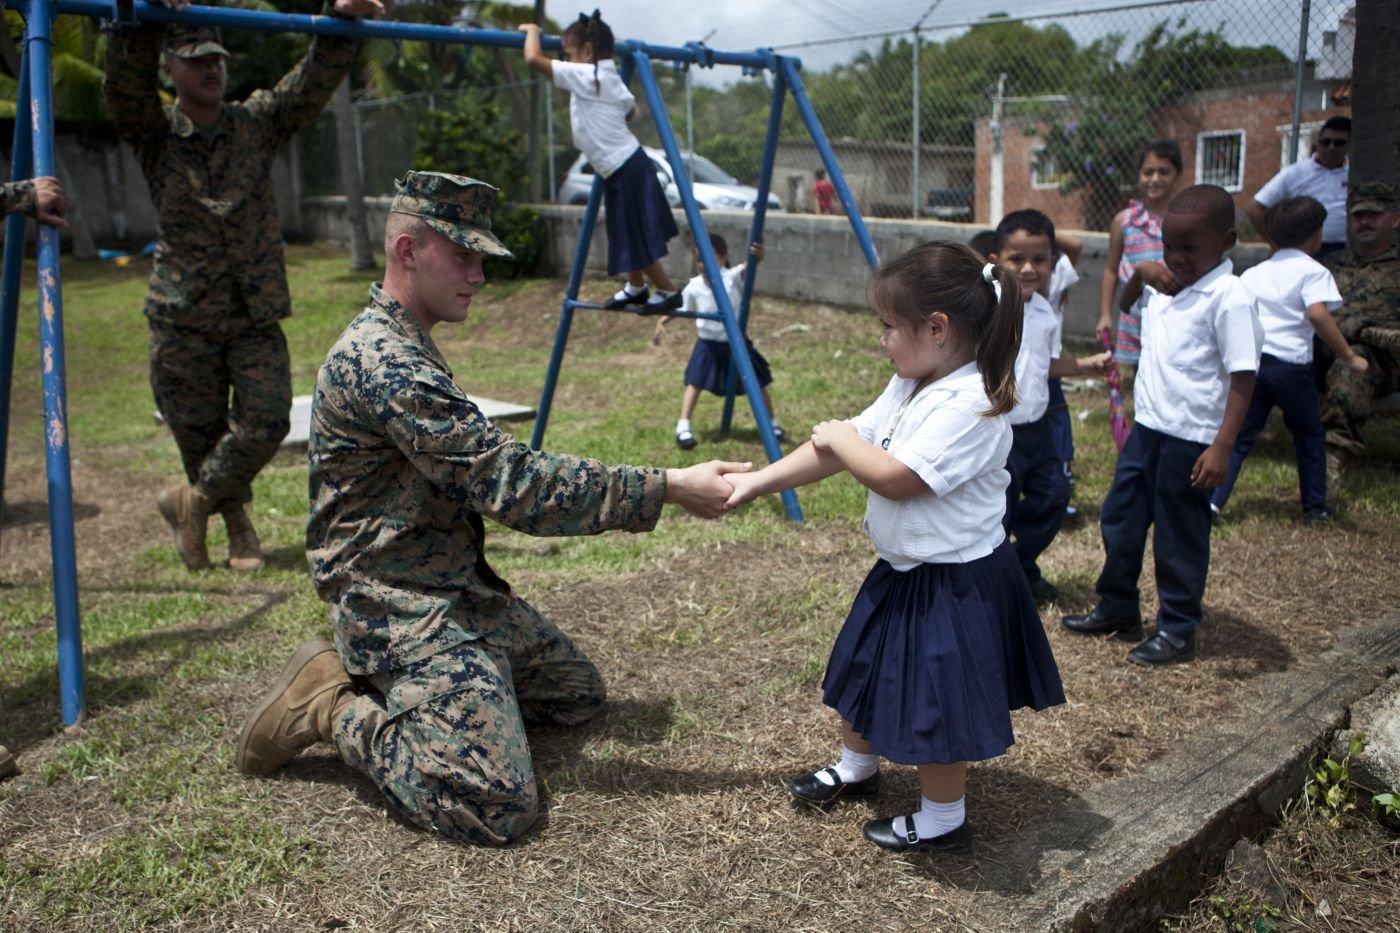 U.S. Marines Complete School Projects in Honduras